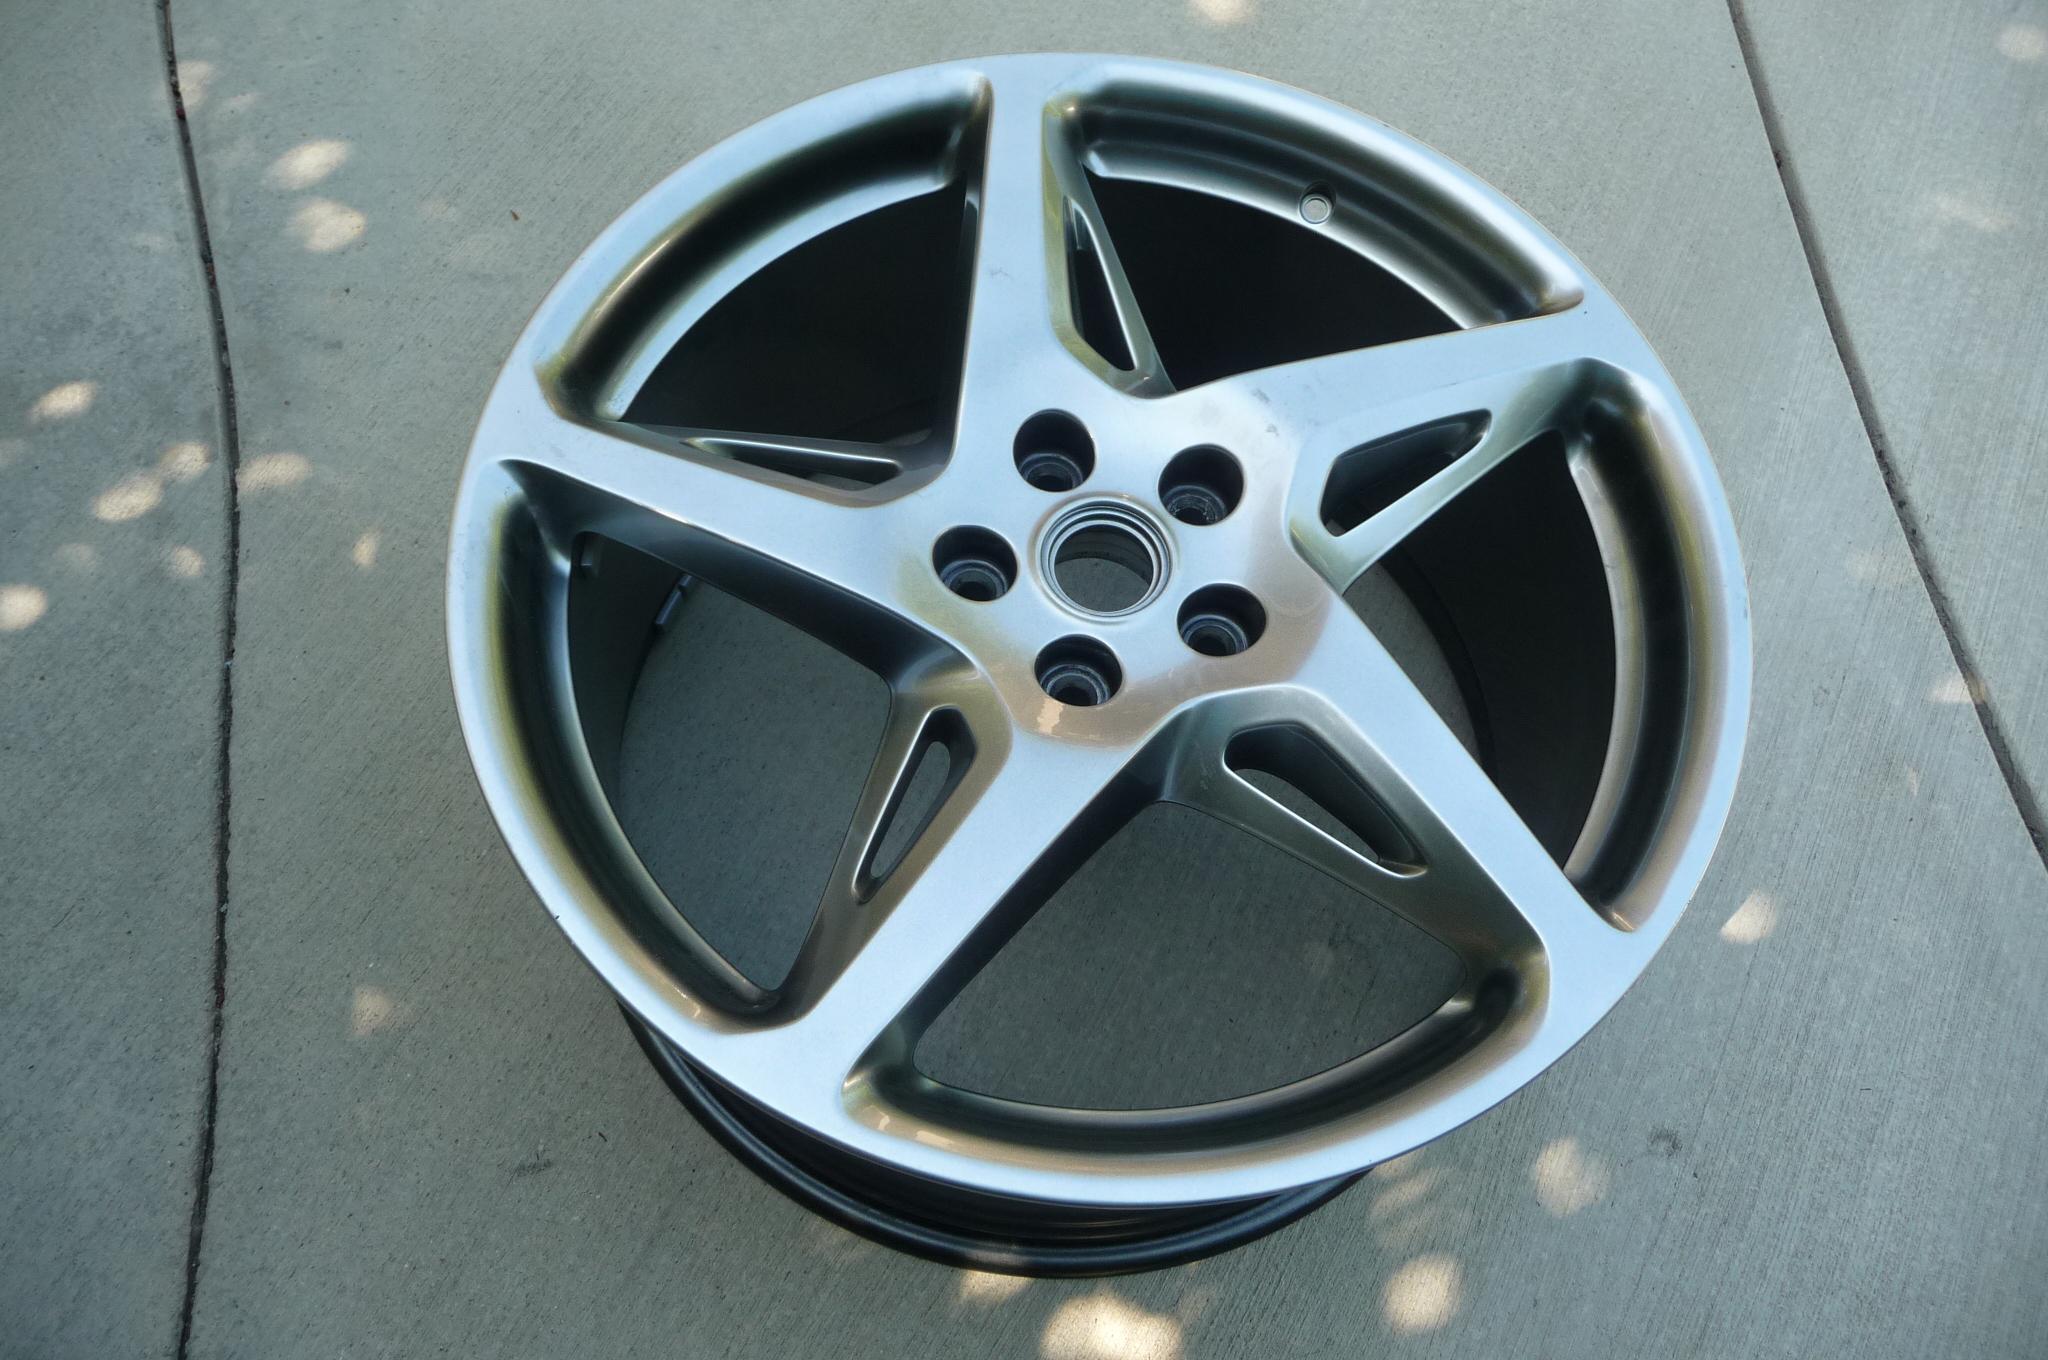 "2010 2011 2012 2013 2014 2015 Ferrari 458 Italia Rear 20"" Fuso Rim Wheel BBSRD481 Chrome Painted 262893 OEM"